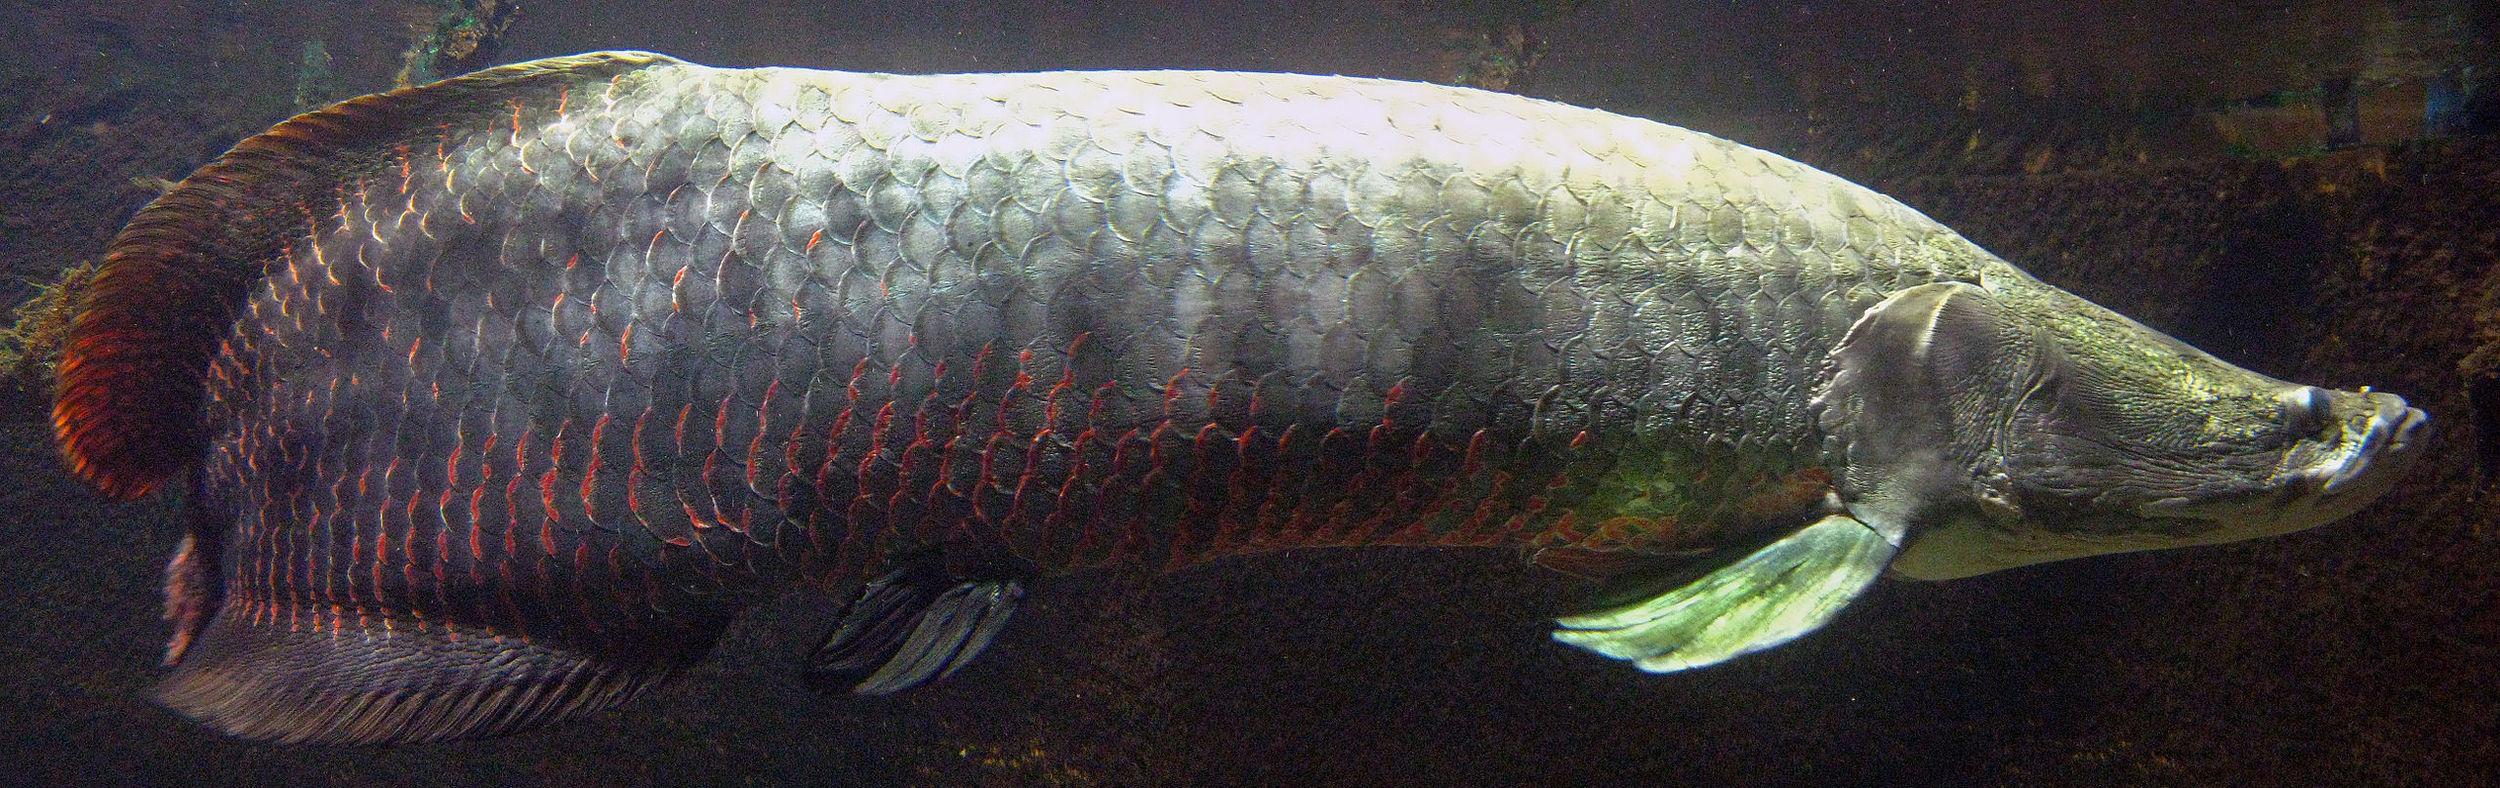 Arapaima fish wikipedia